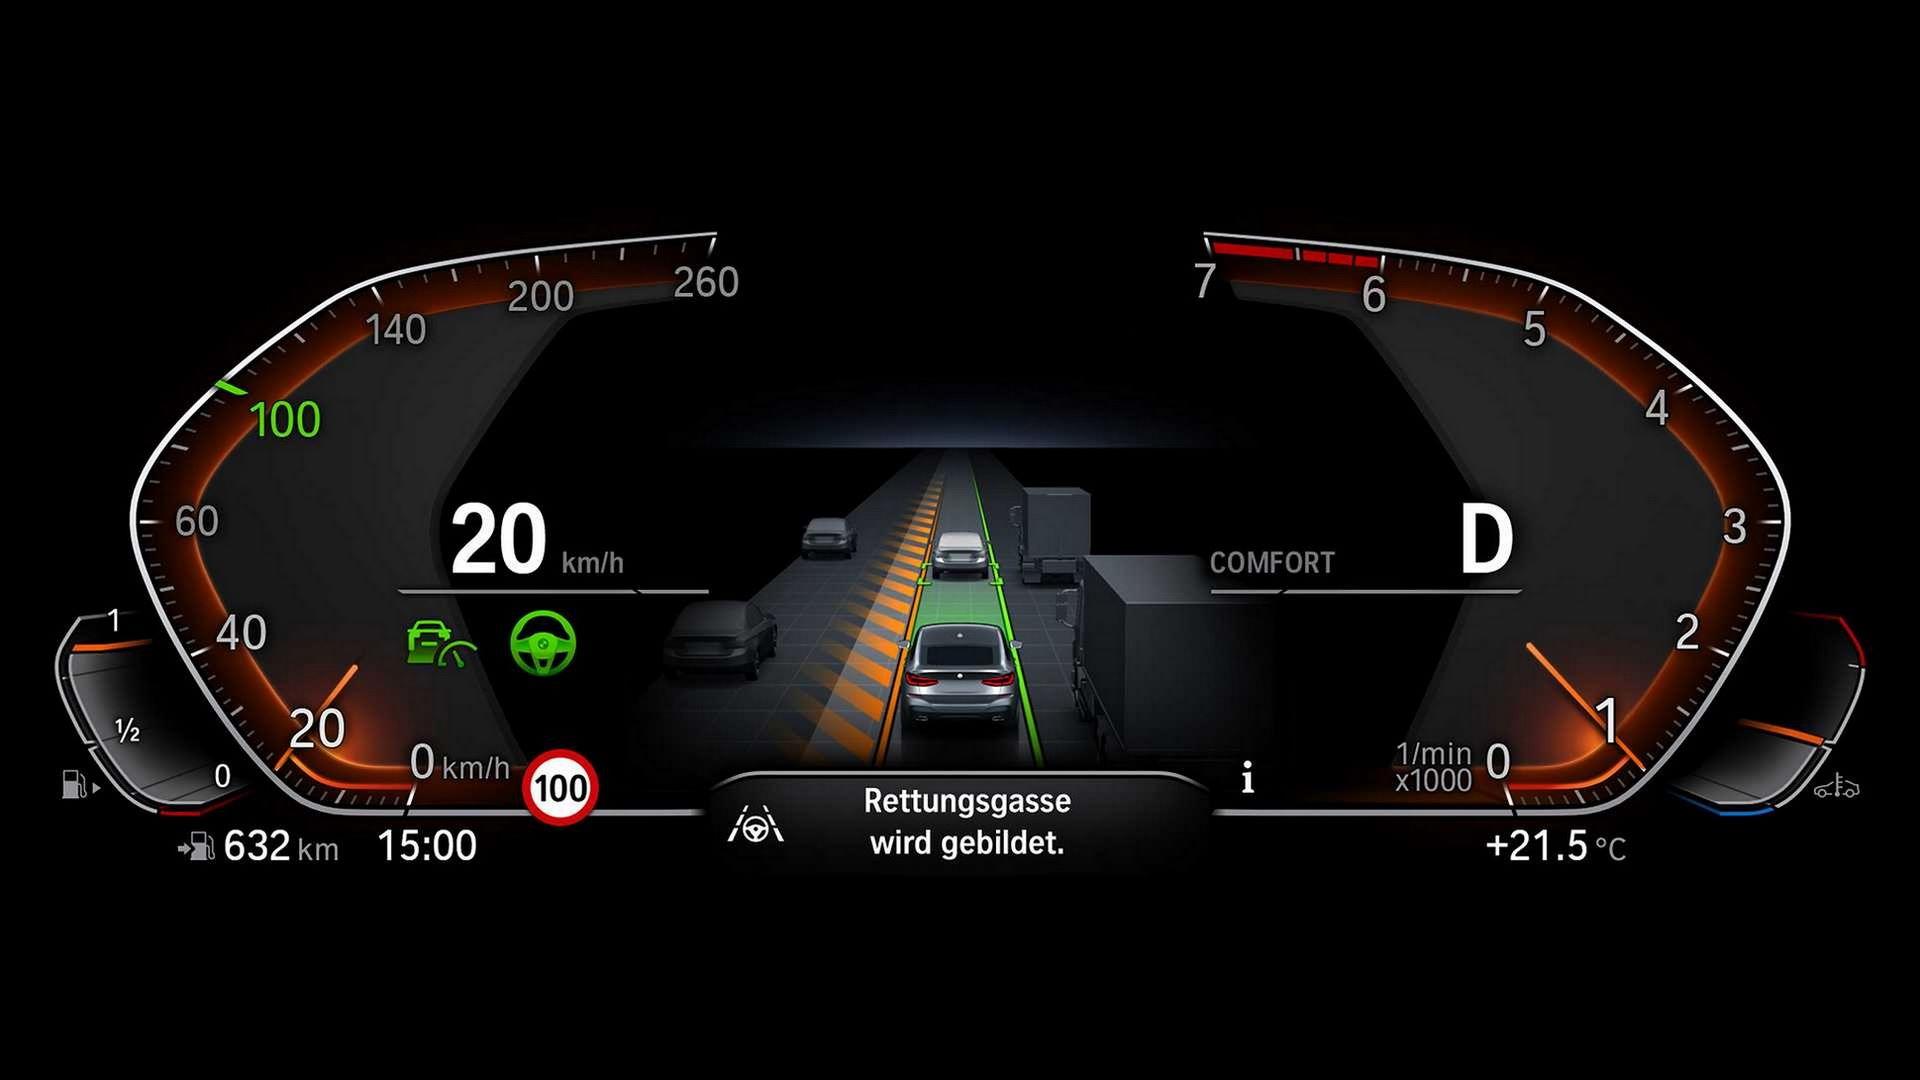 BMW-6-Series-GT-Gran-Turismo-facelift-2021-28